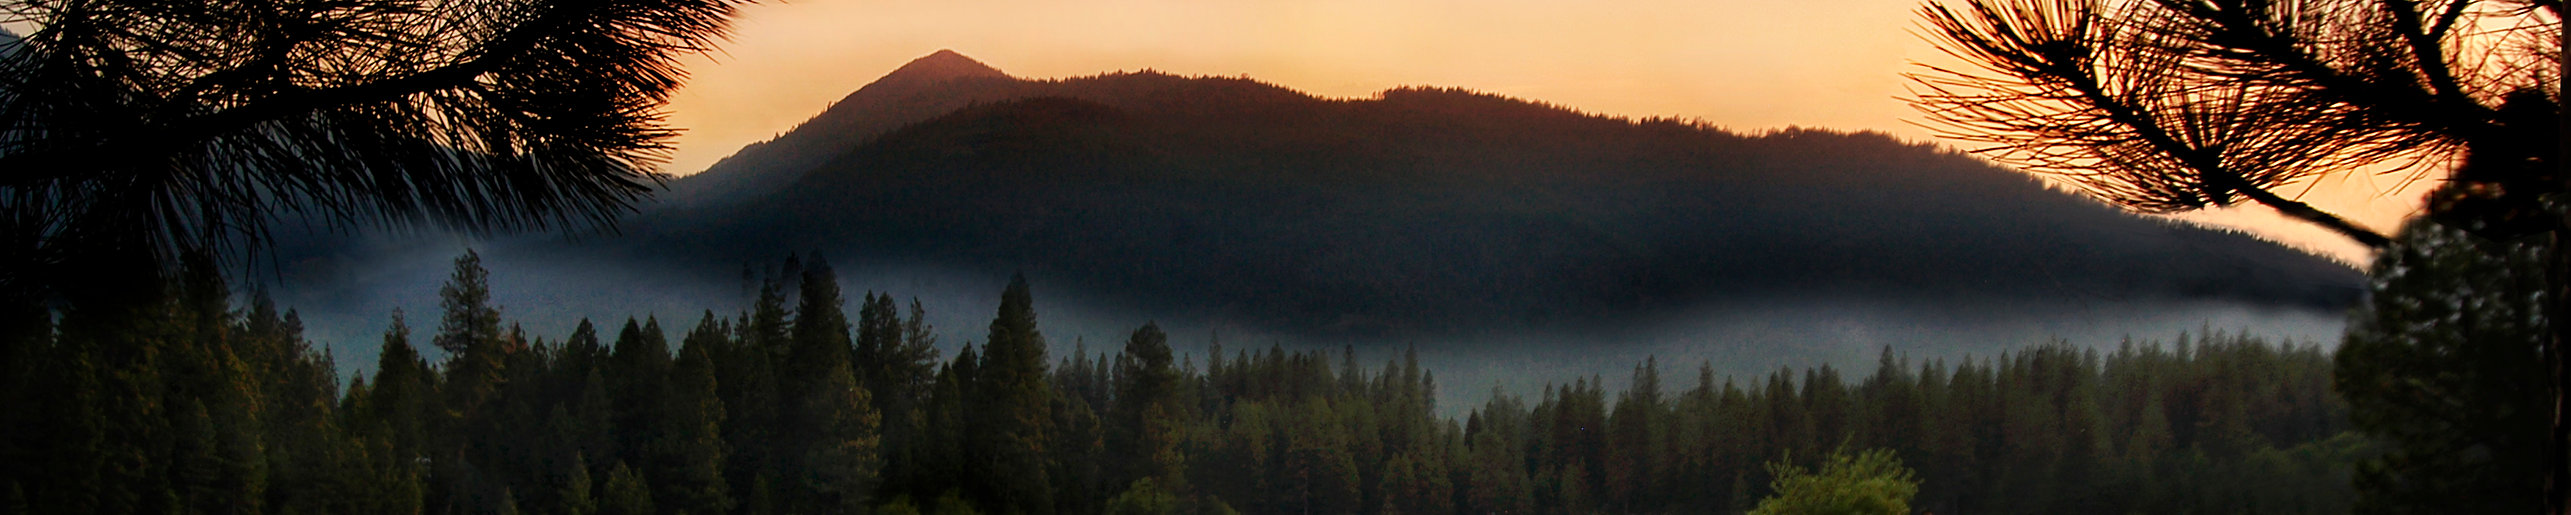 pond sunset slice.jpg